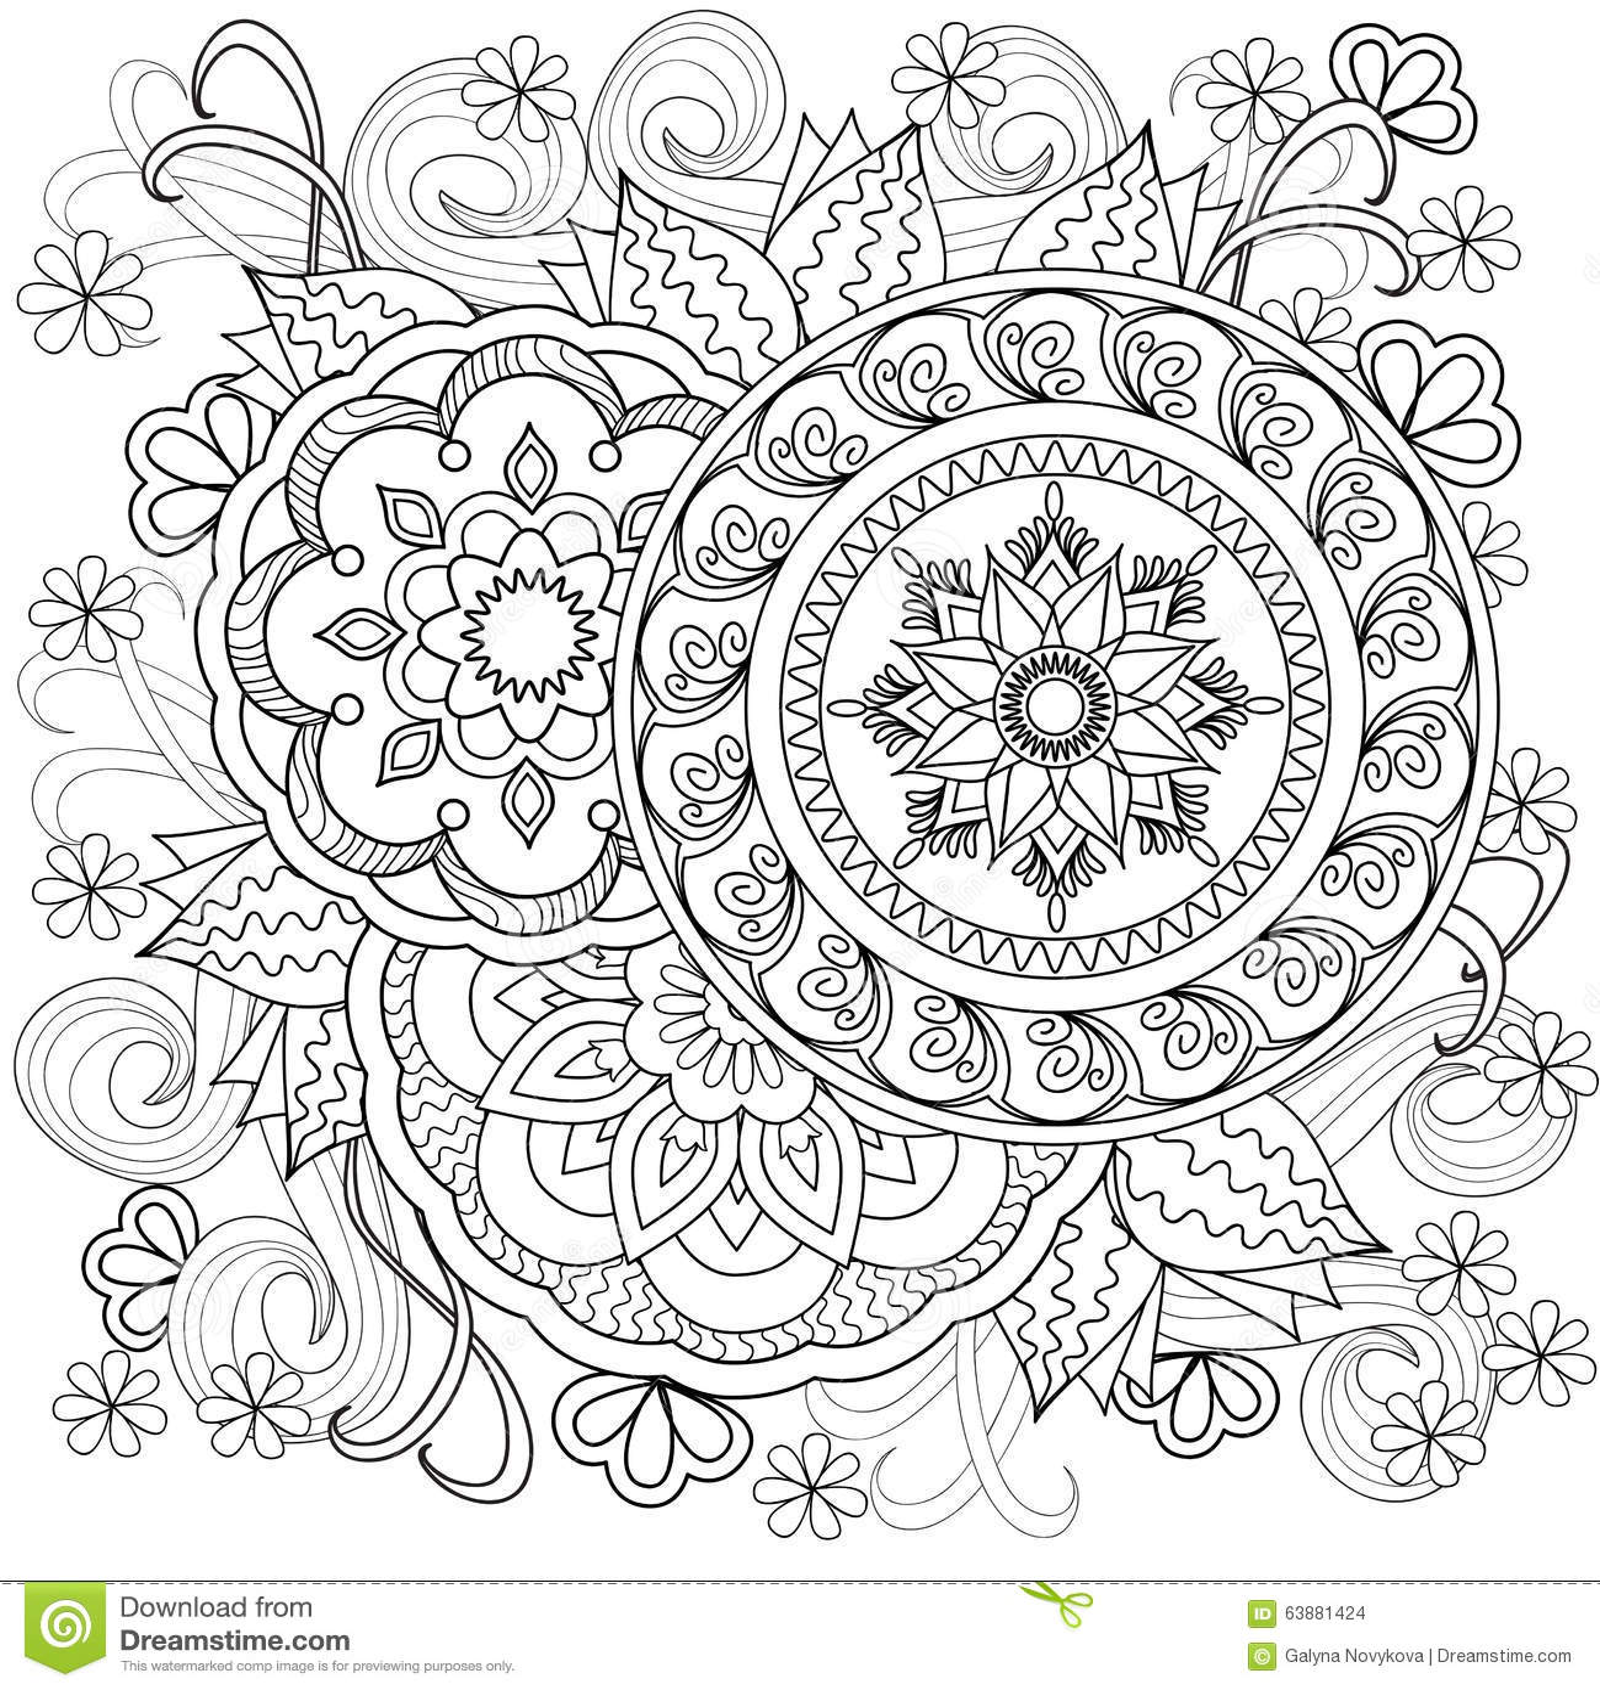 Flowers Mandalas B10 Stock Vector Image Of Ethnic Drawn